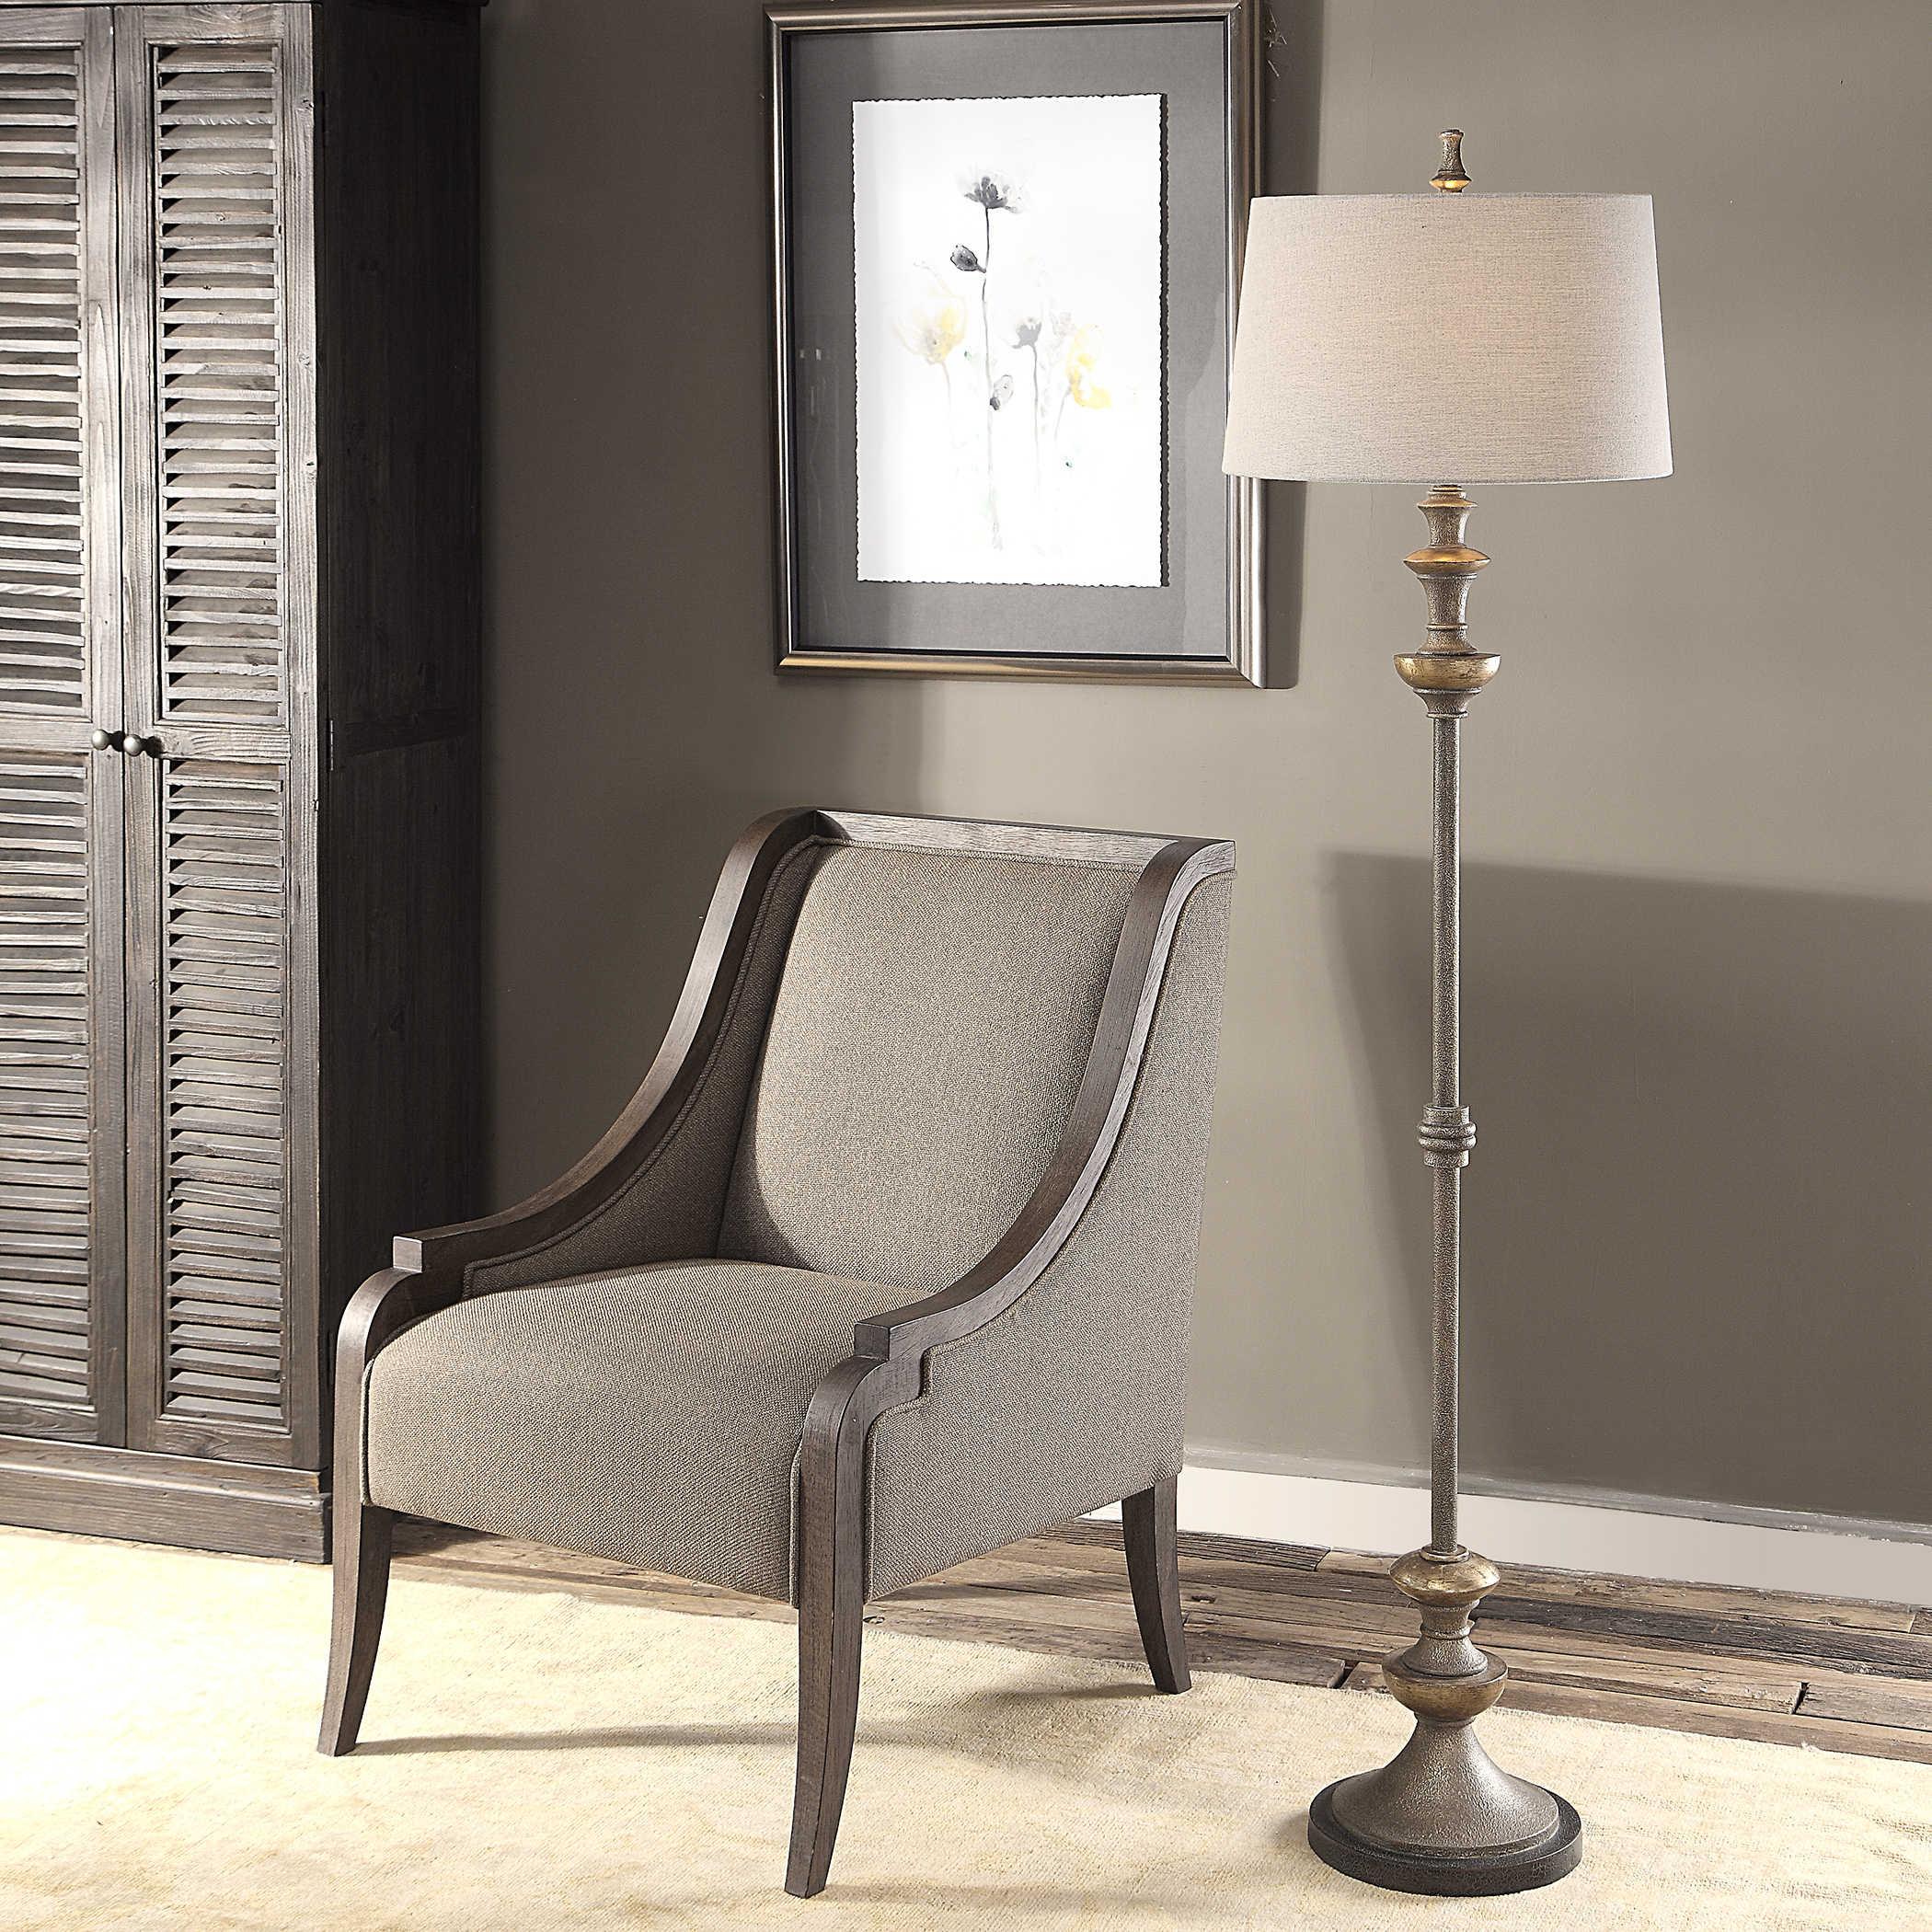 Decorative Lamp Shade Finials